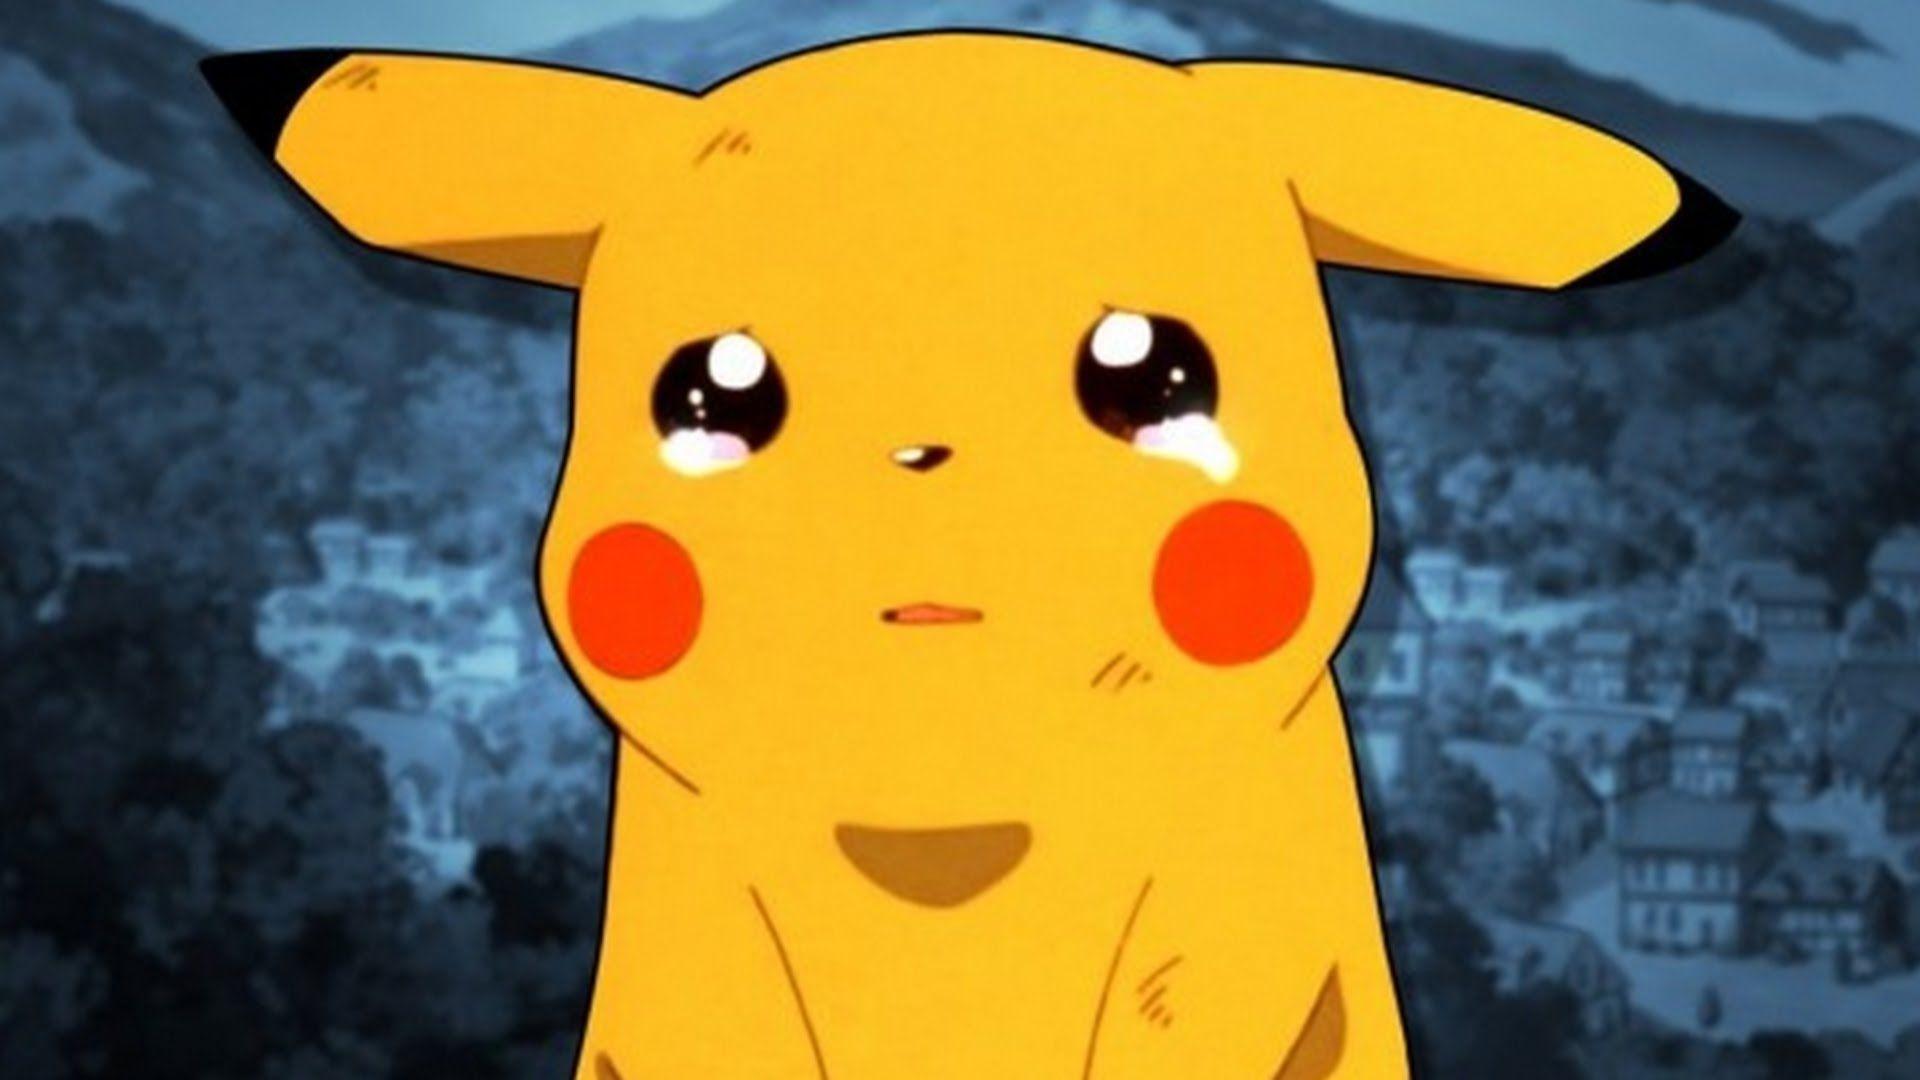 Crying Pikachu Wallpapers - Top Free Crying Pikachu ...